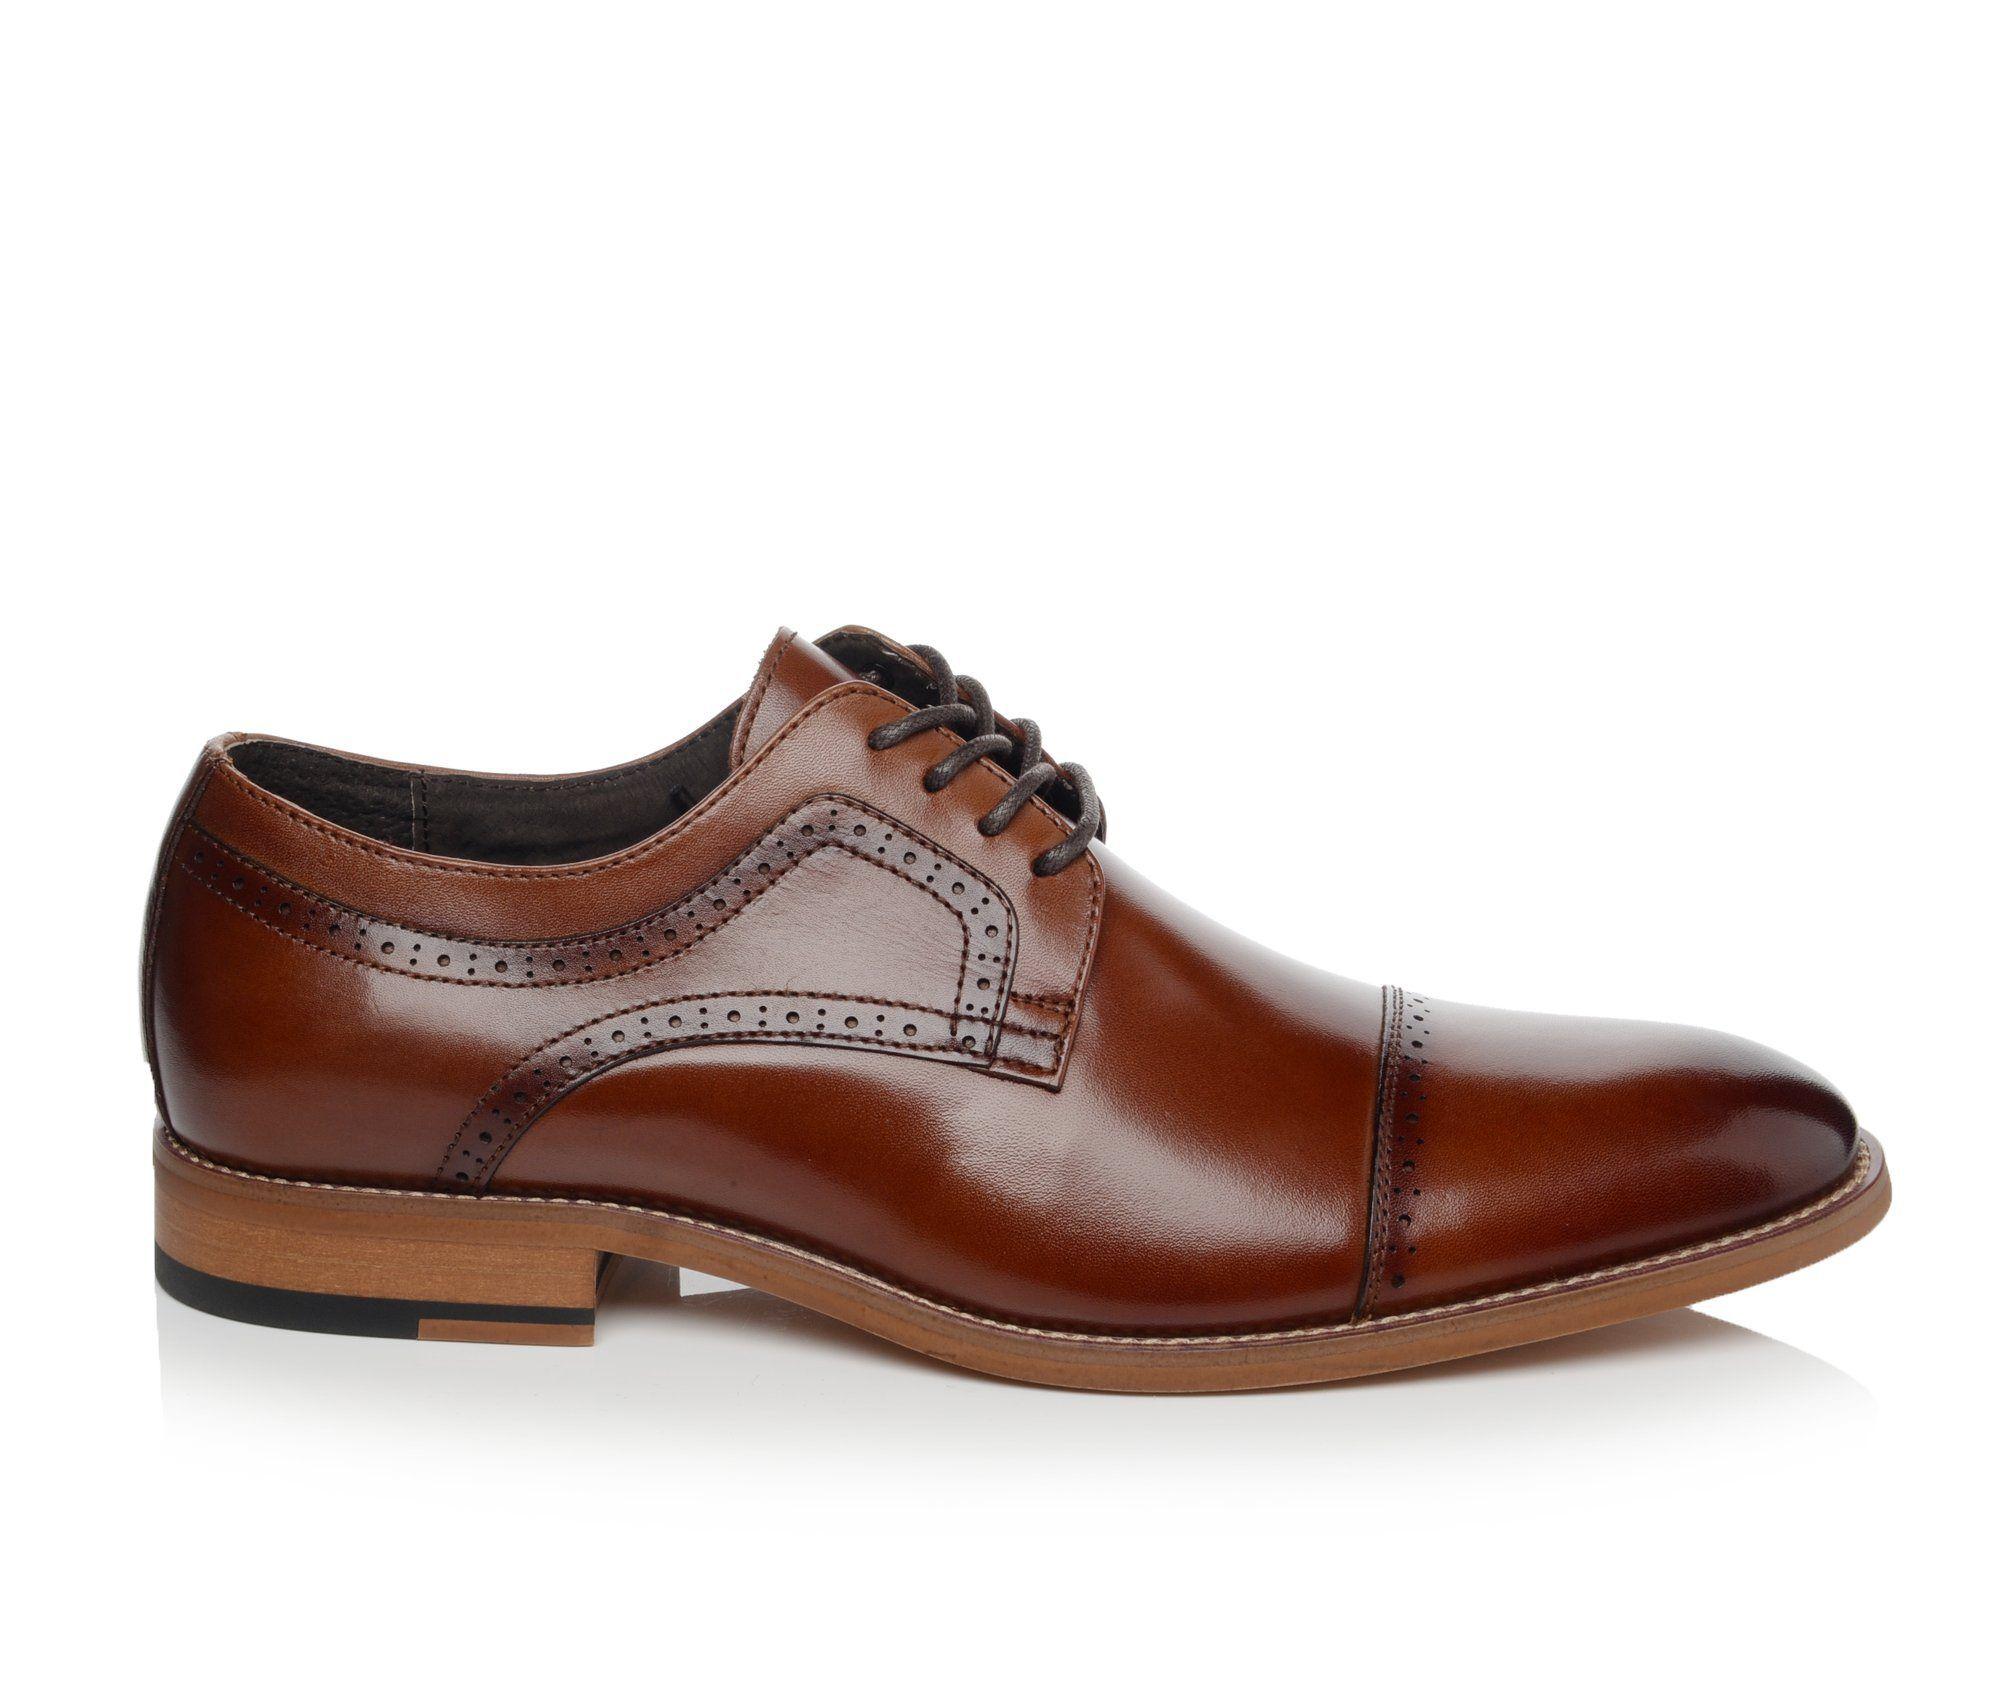 Men's Stacy Adams Dickinson Dress Shoes Cognac